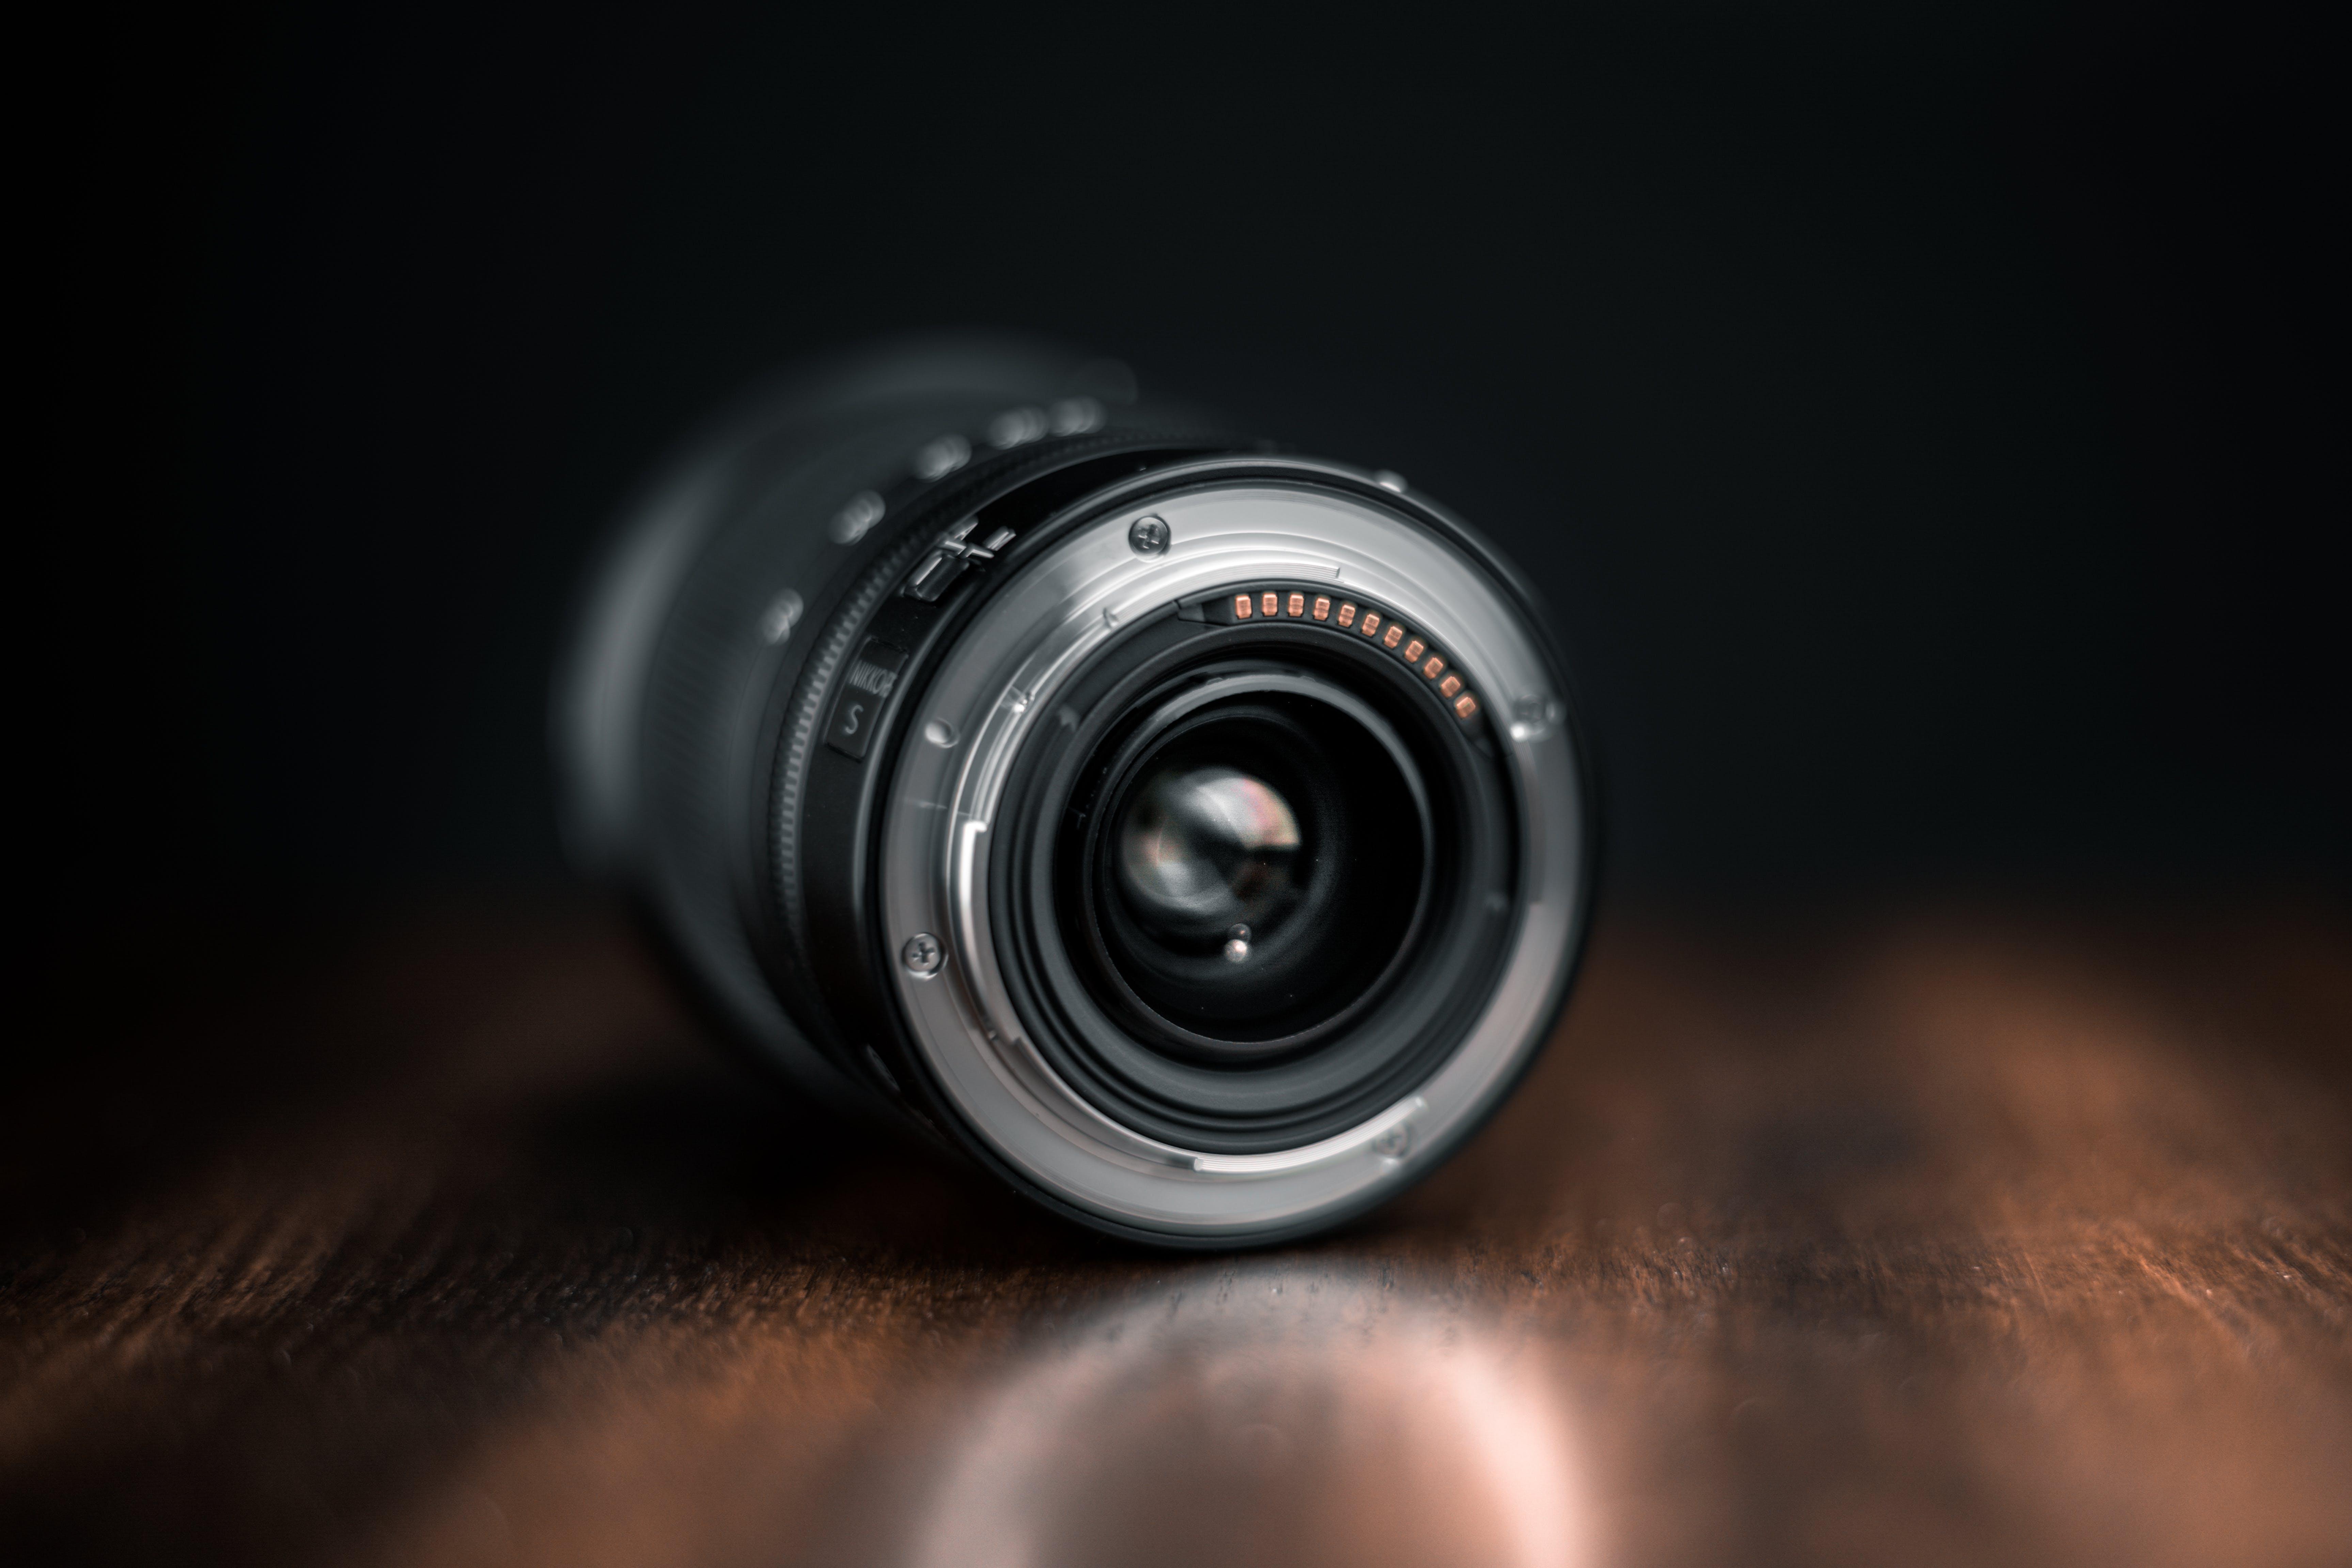 Kostenloses Stock Foto zu analogon, ausrüstung, elektrik, fokus